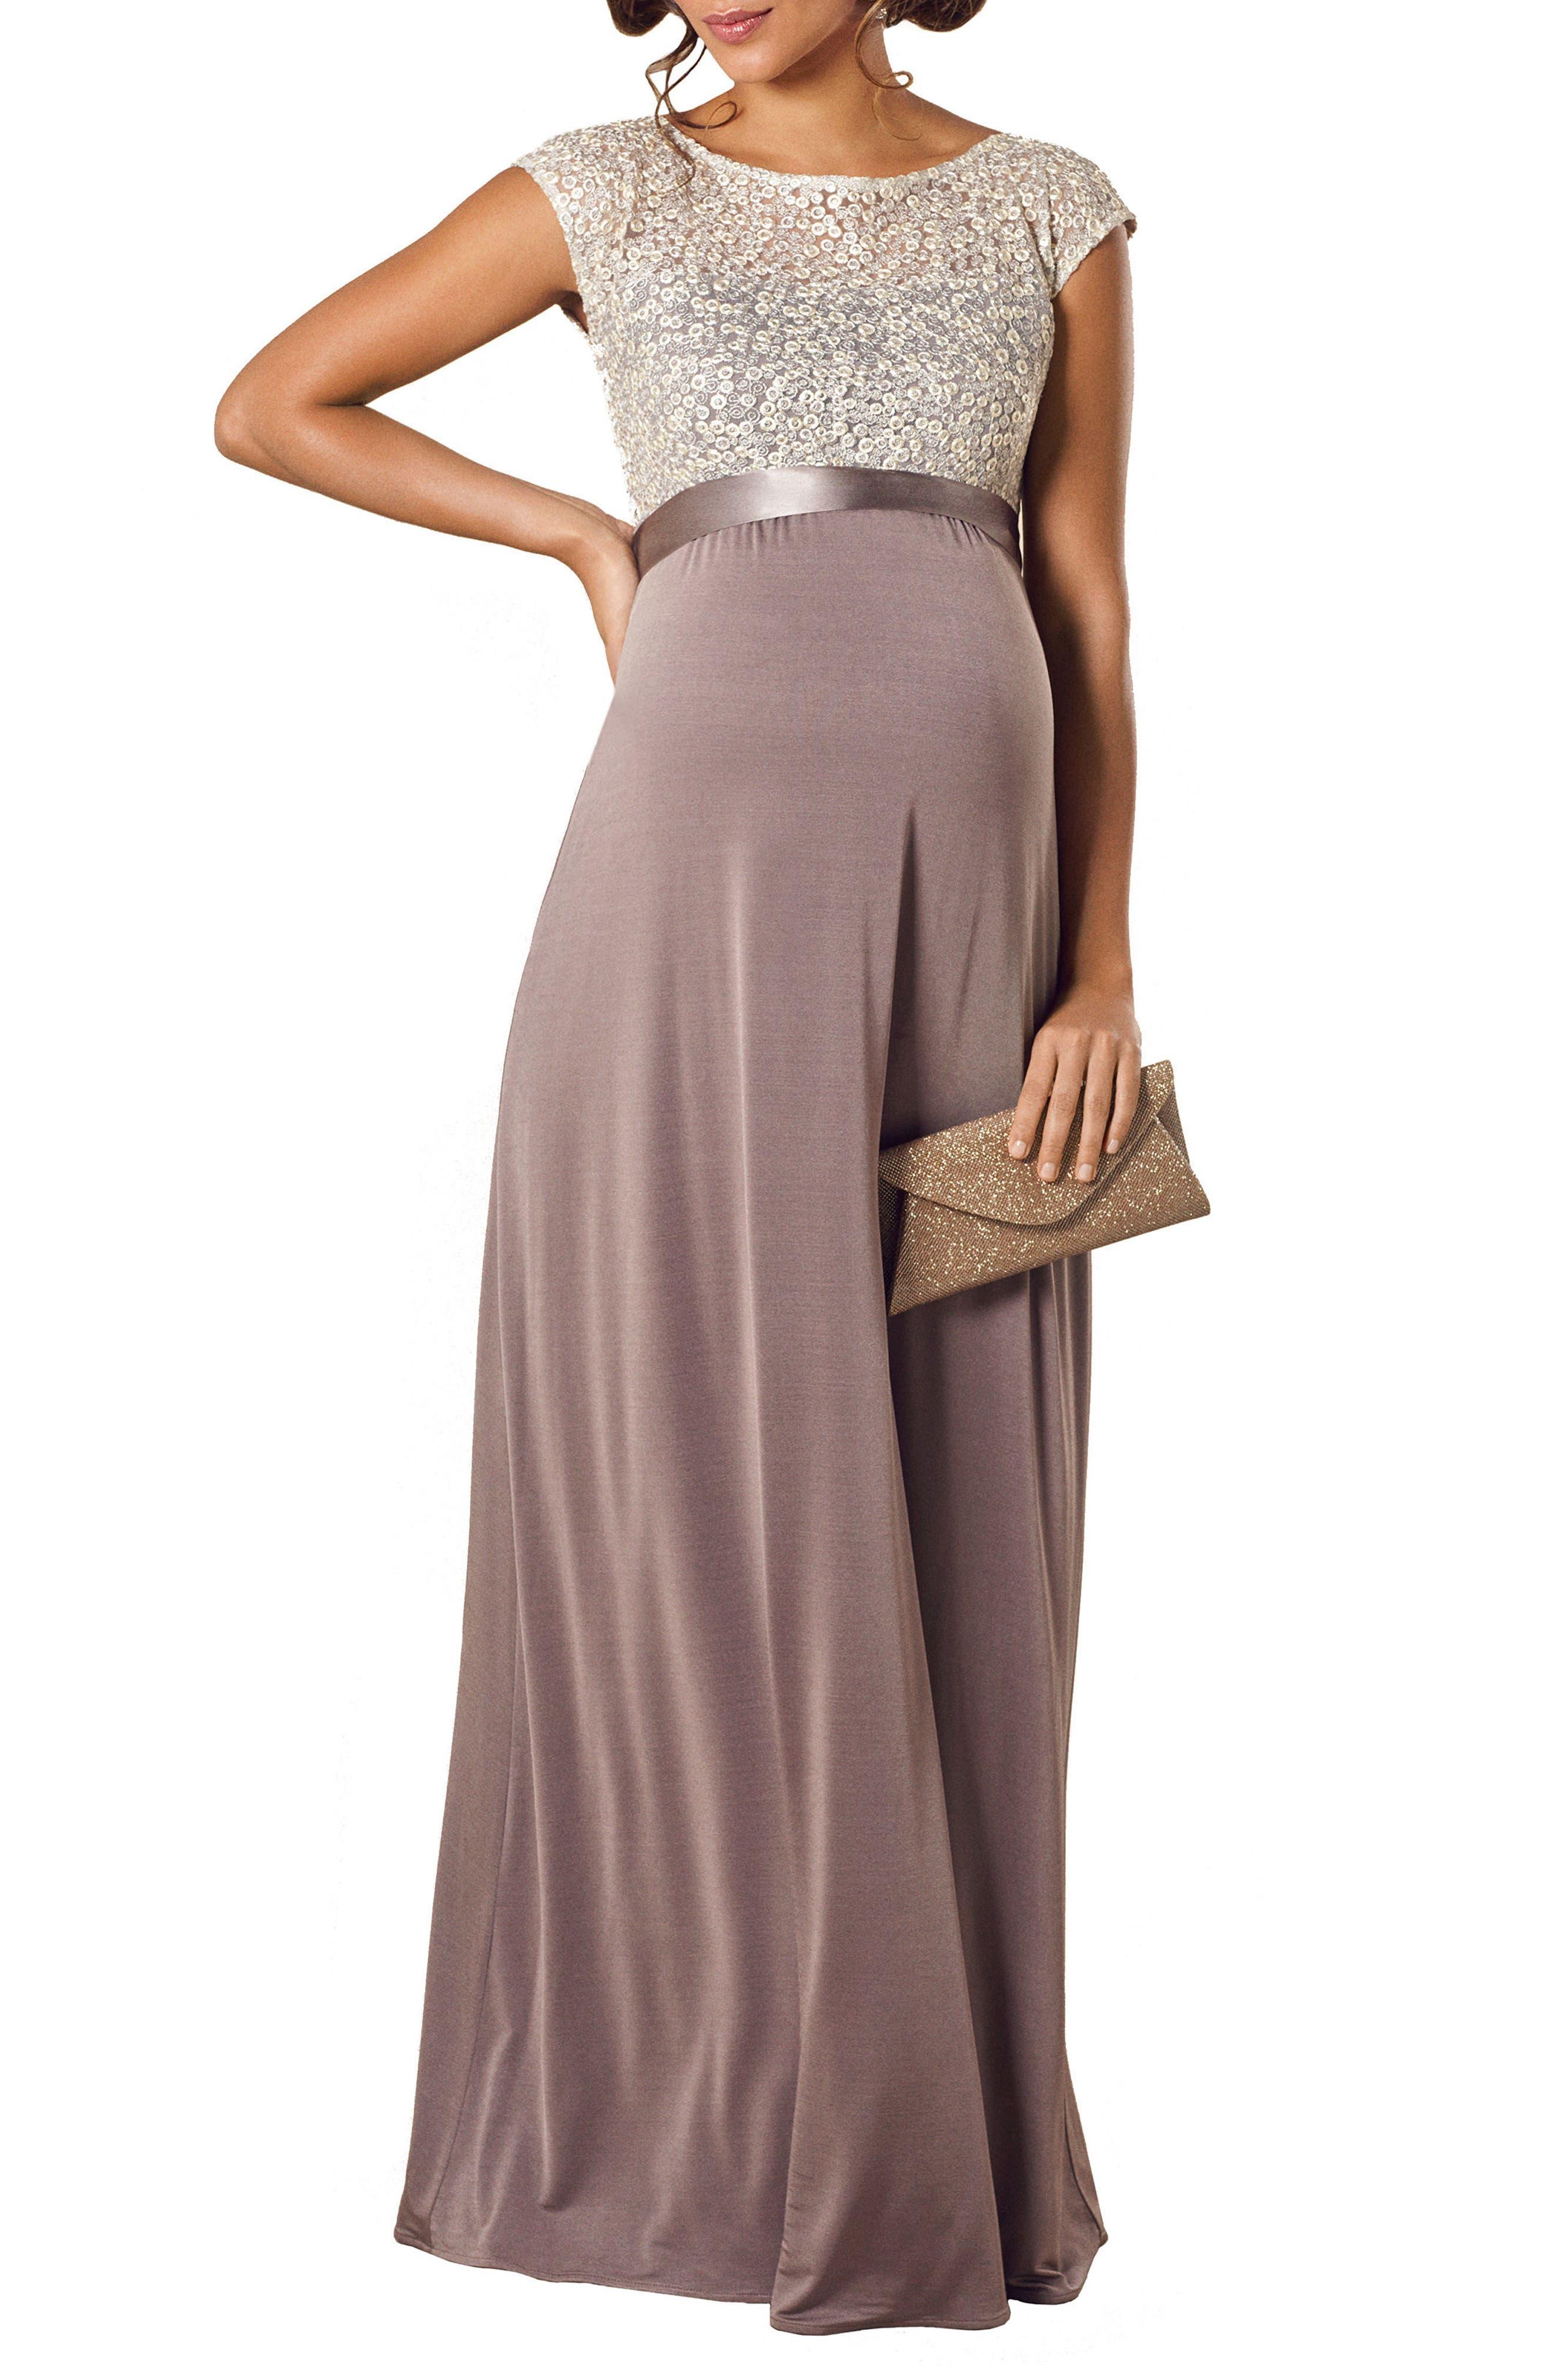 Mia Maternity Gown,                         Main,                         color, DUSKY TRUFFLE